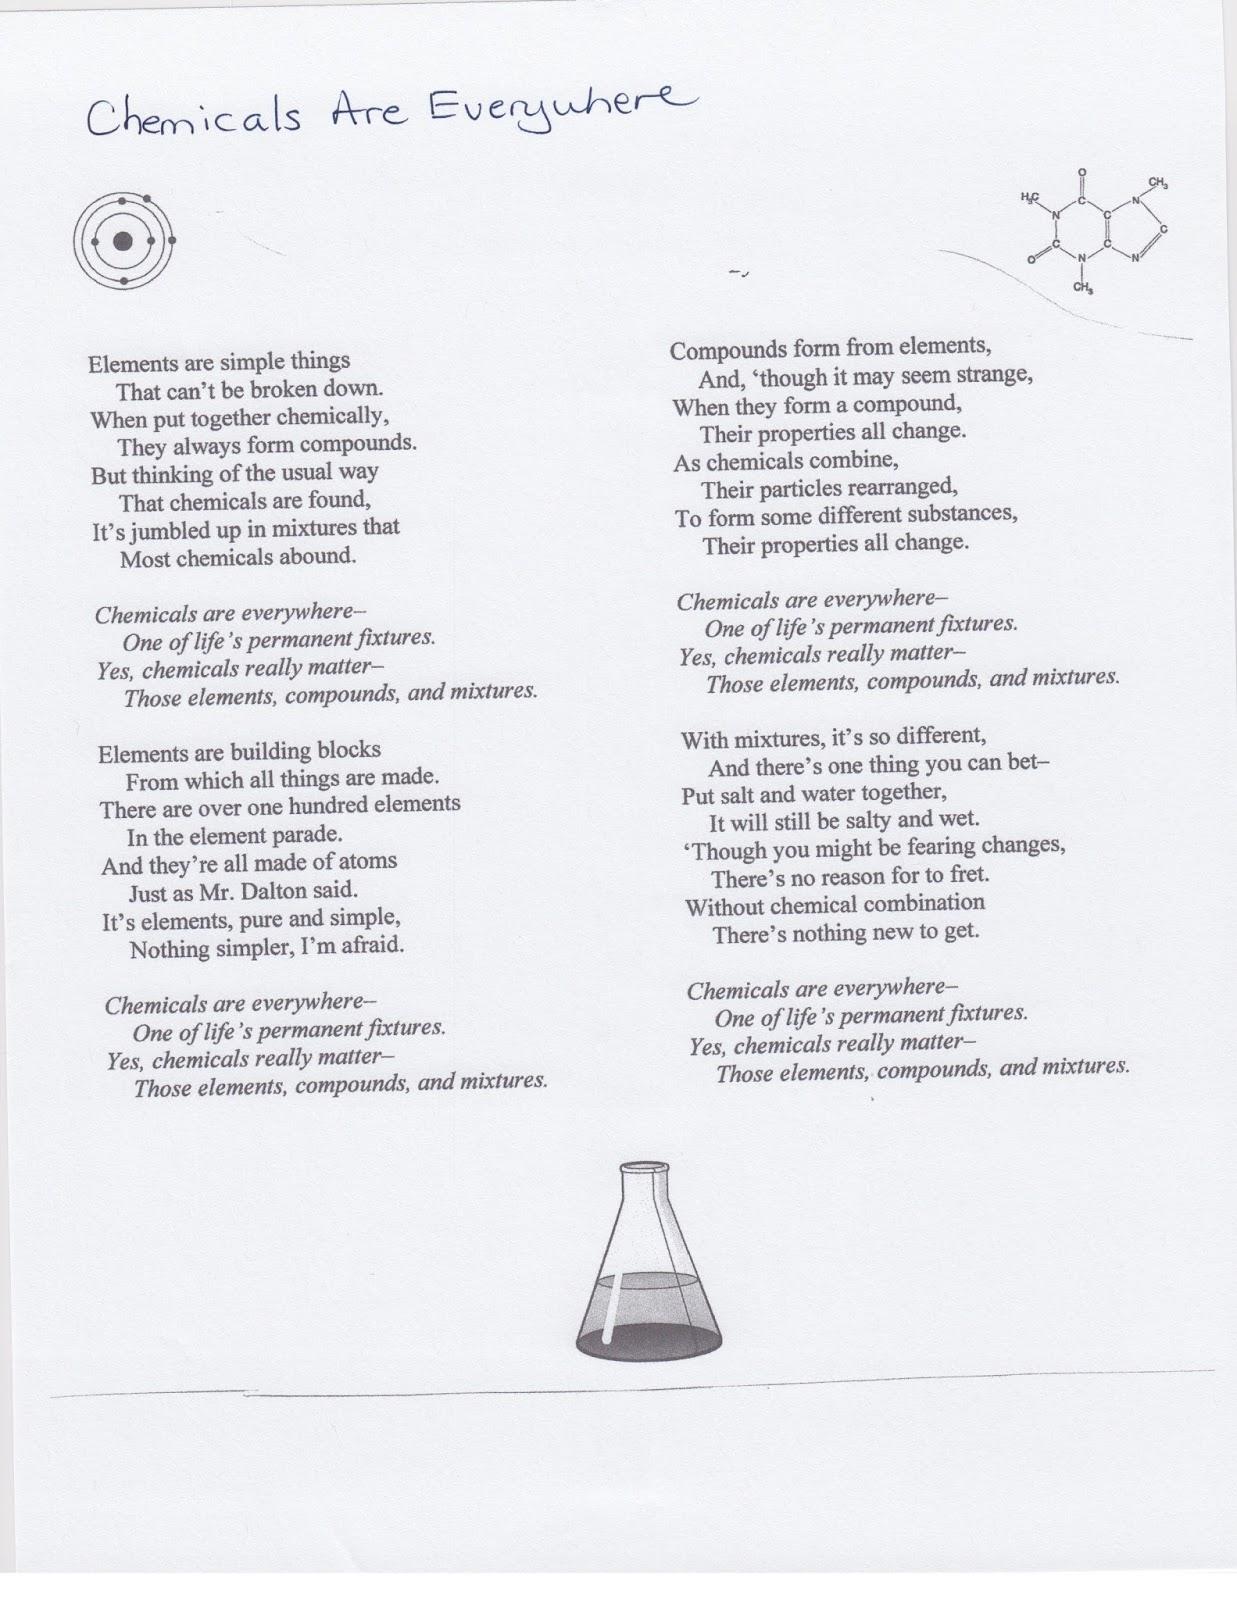 Drden S Chemistry Class October